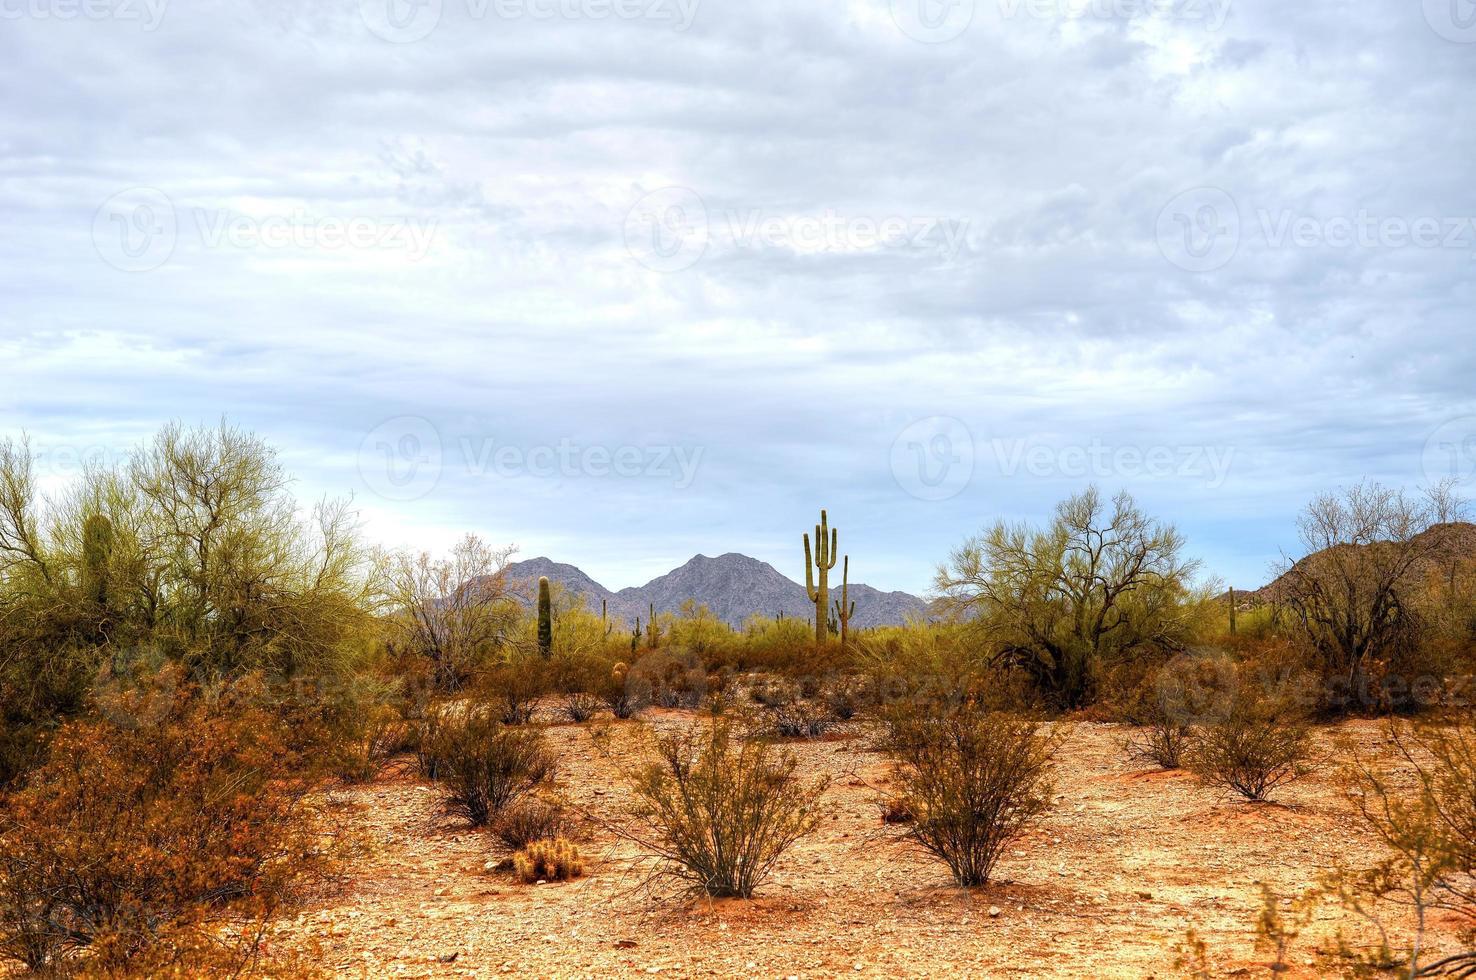 Sonora woestijn foto